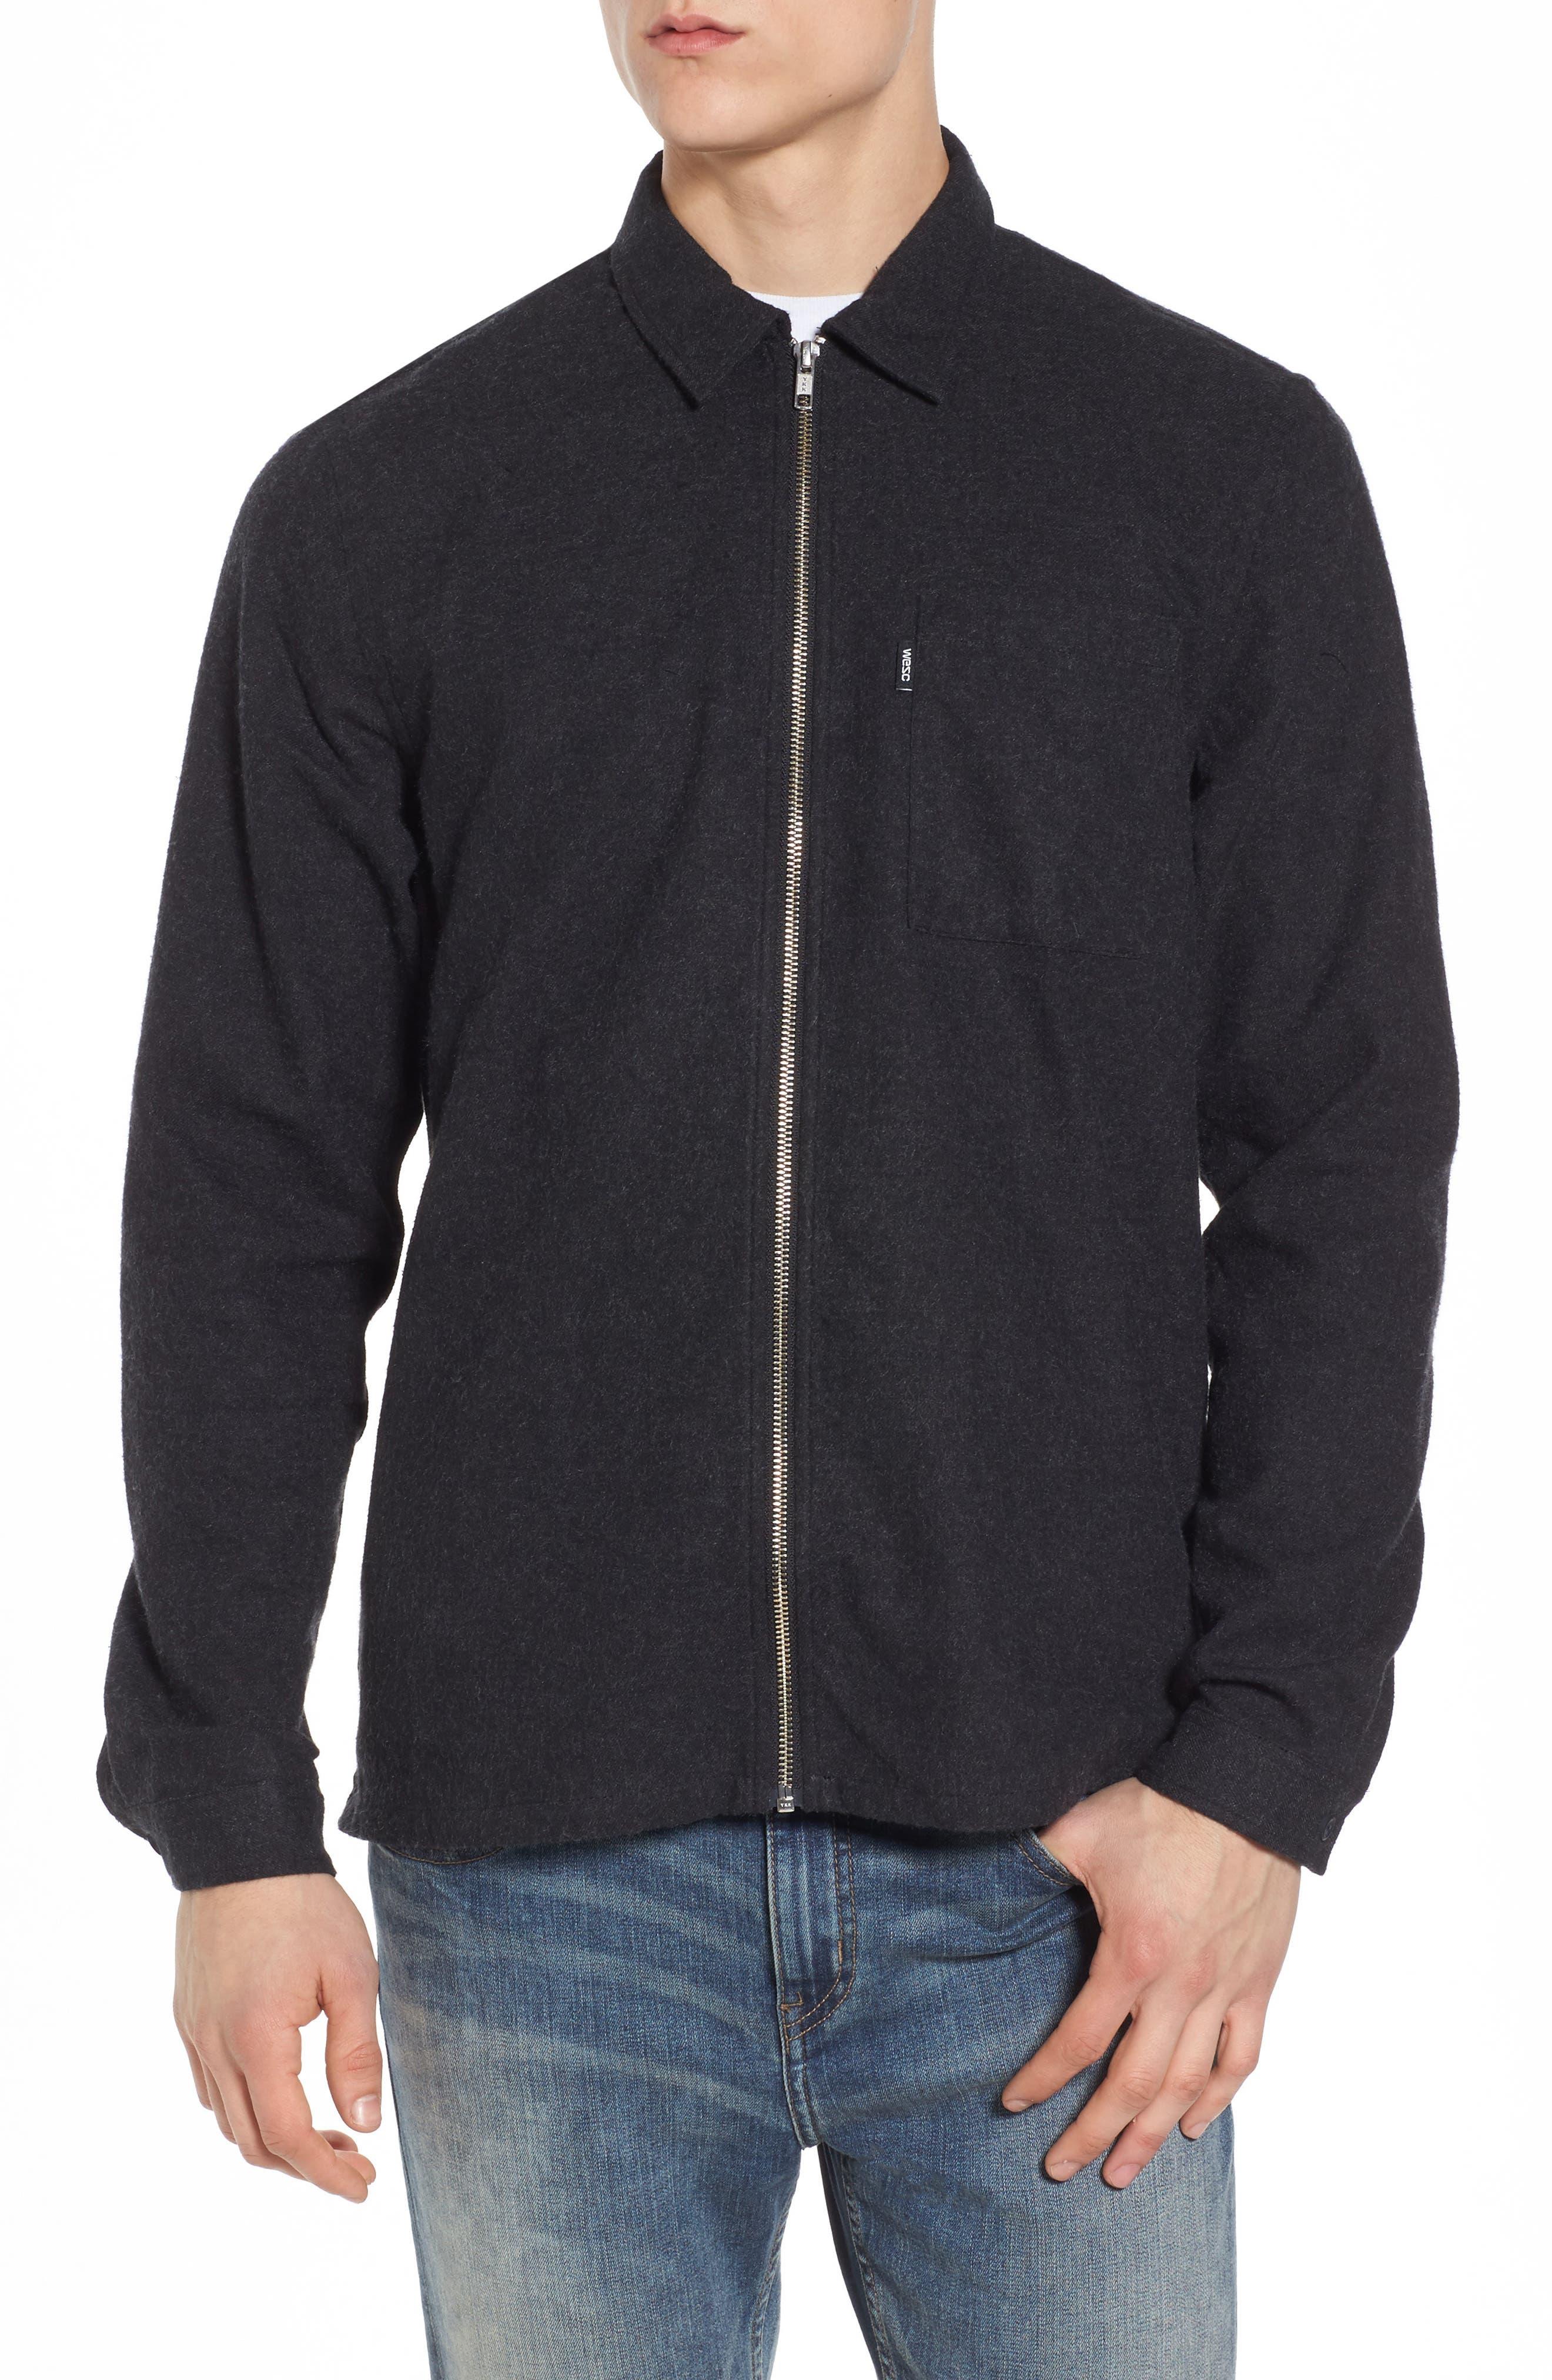 Main Image - WeSC Nicks Flannel Zip Overshirt